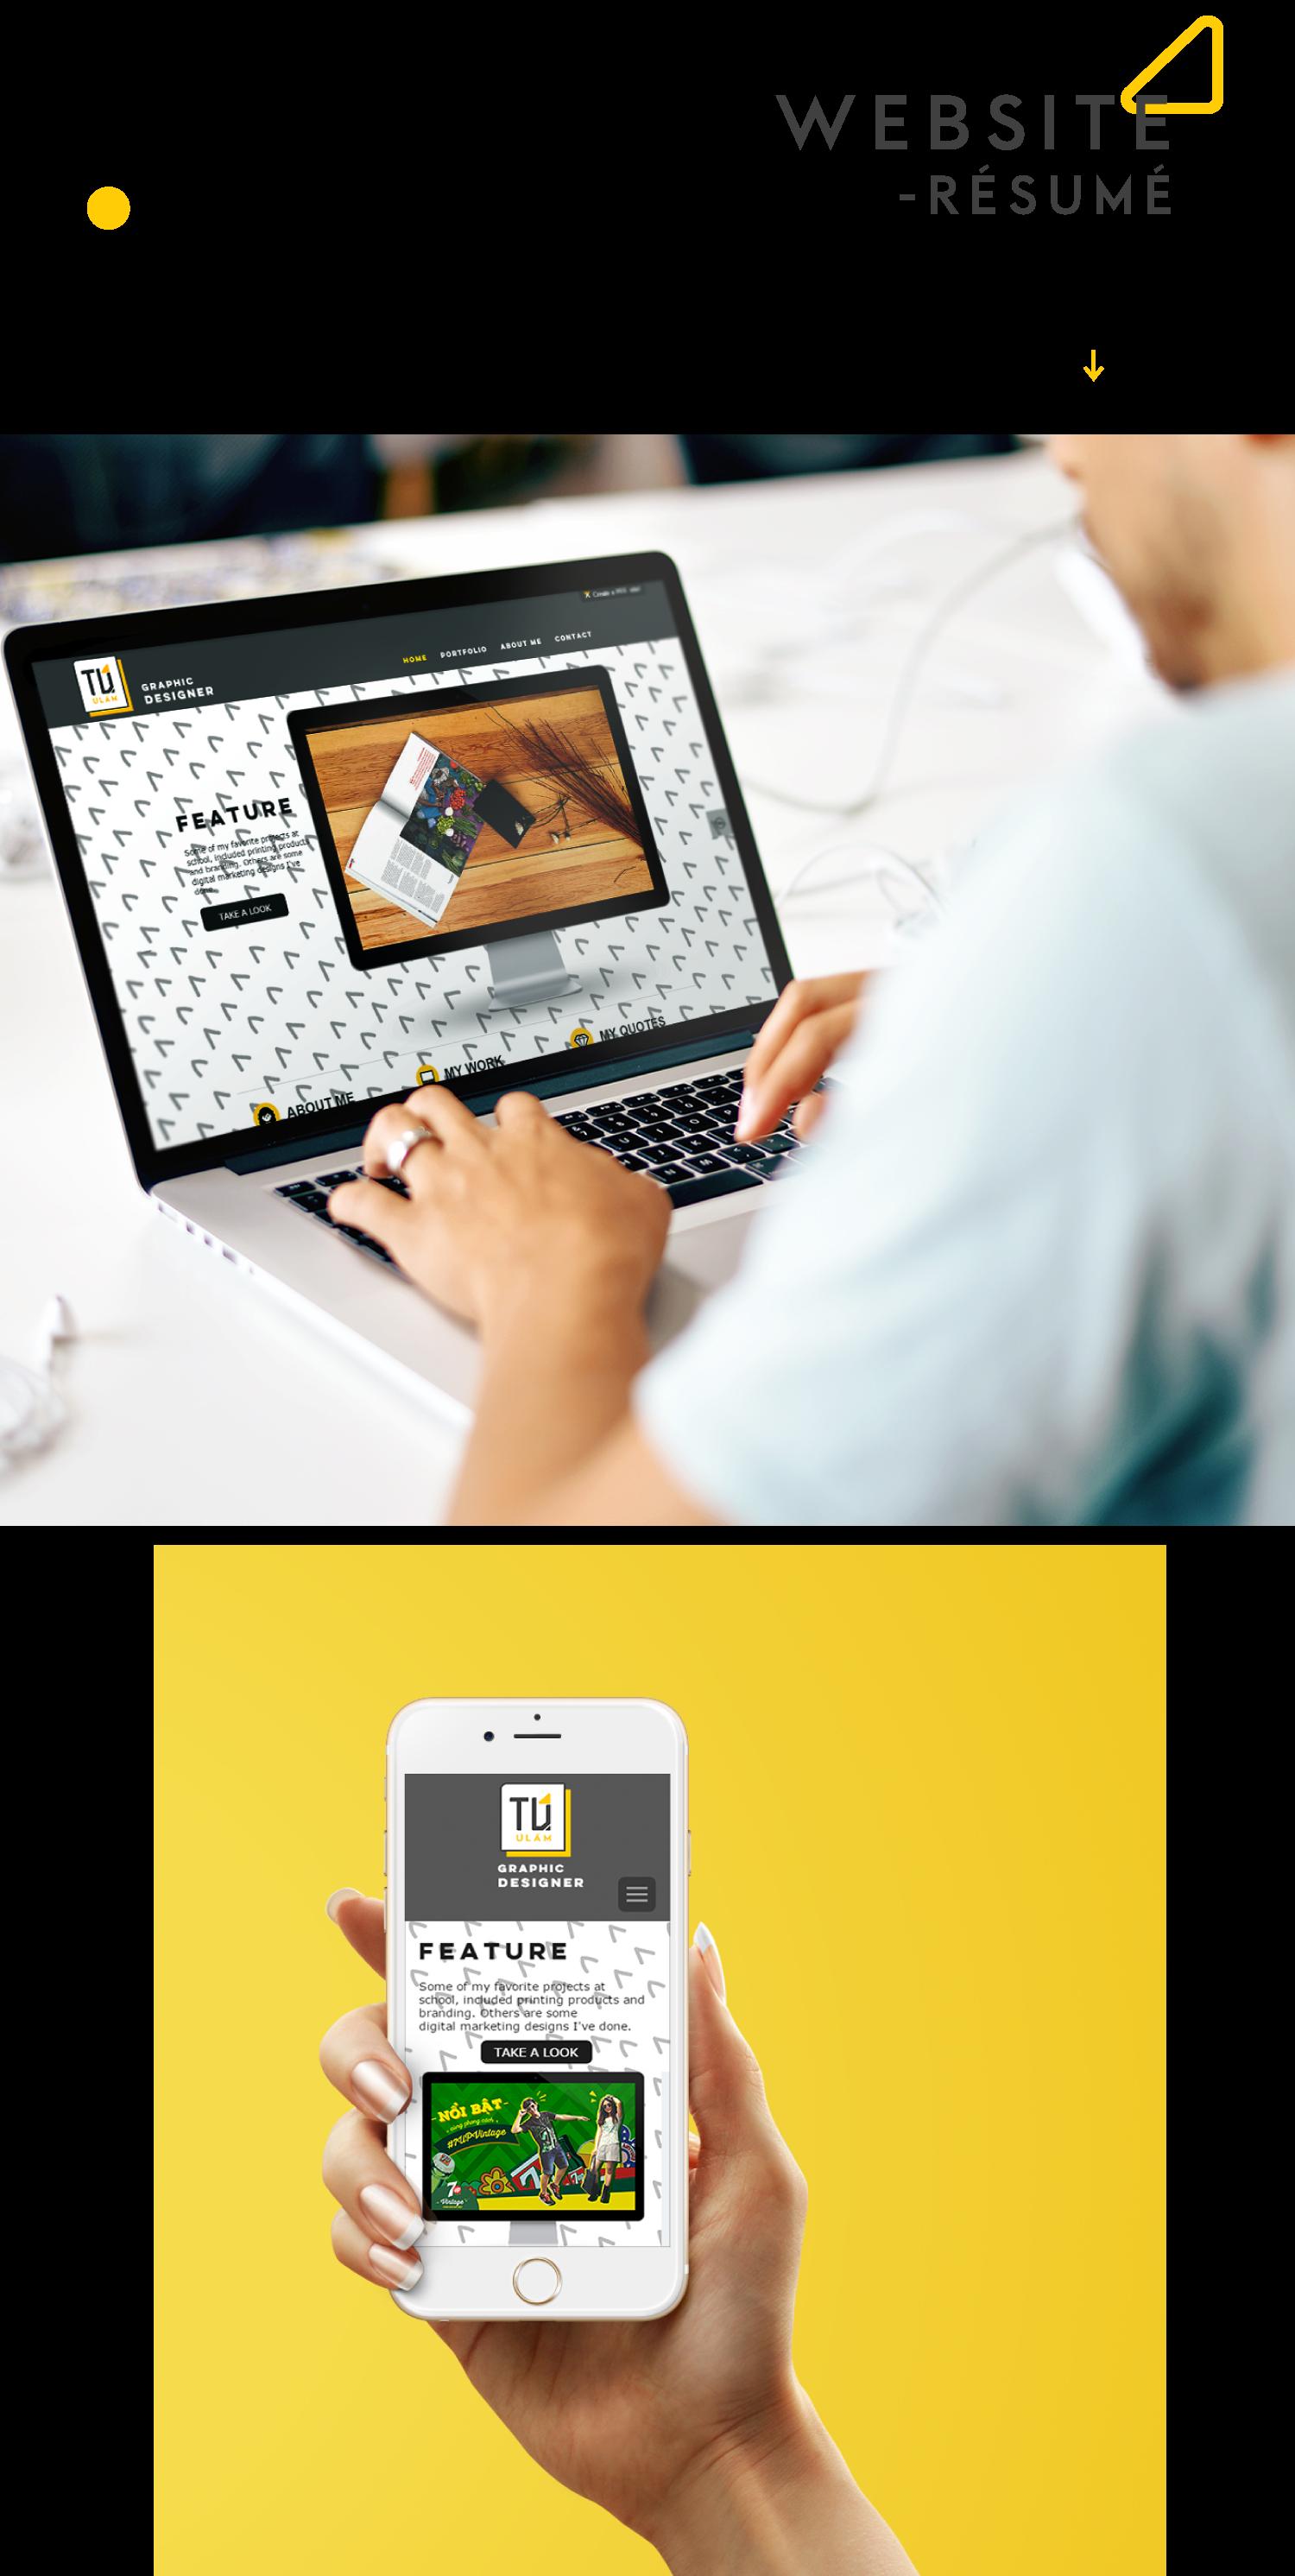 Tu U Lam - Self Branding/ Résumé/ Portfolio on Behance